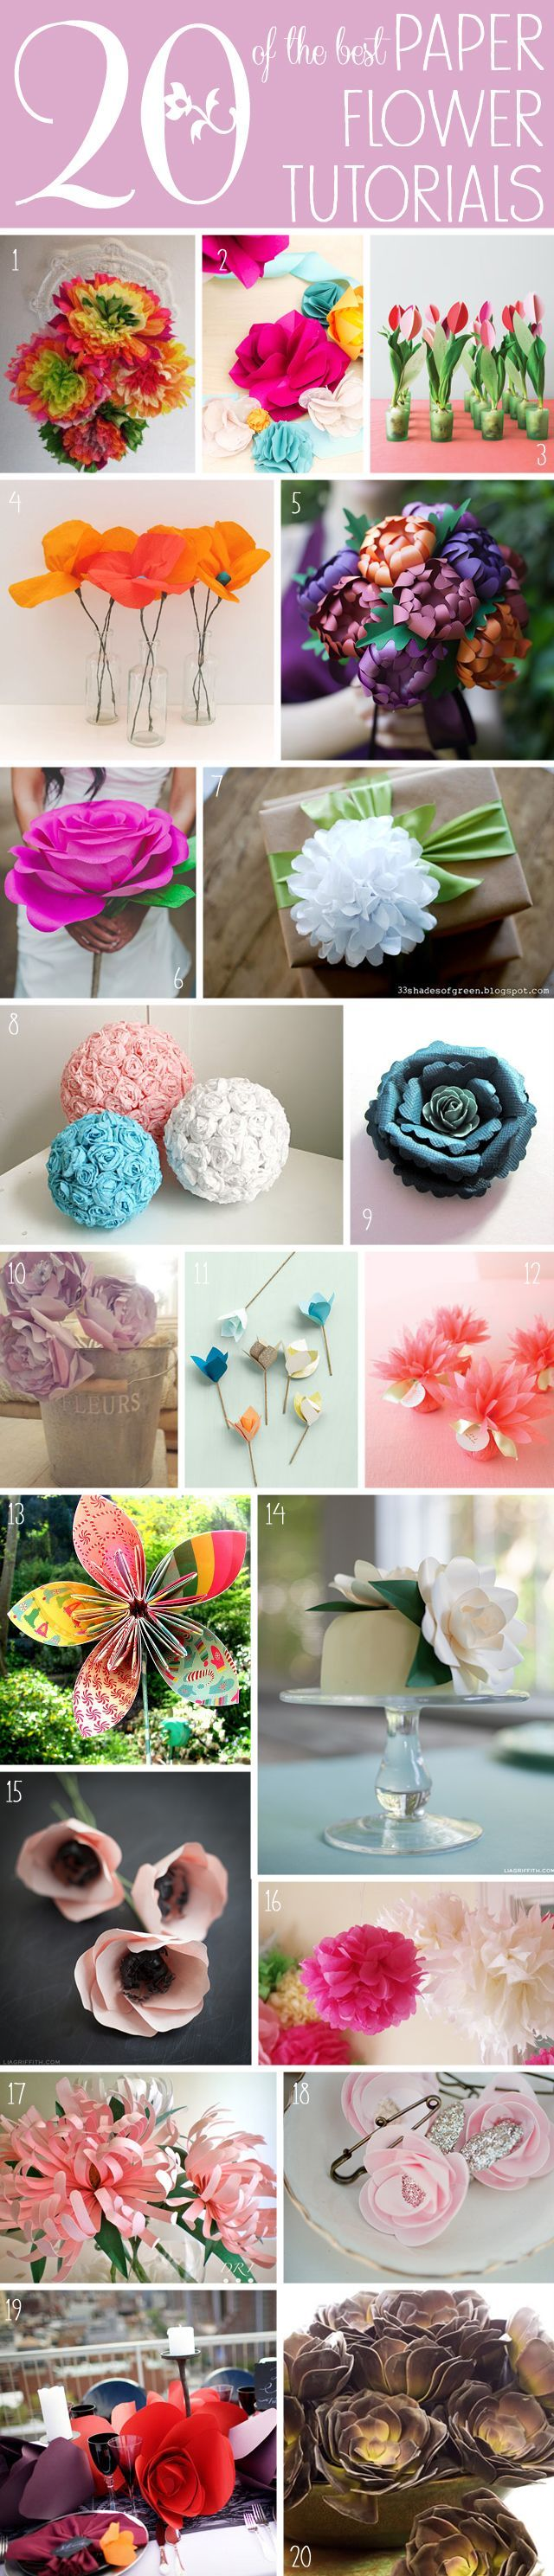 20 of the Best Paper Flower Tutorials